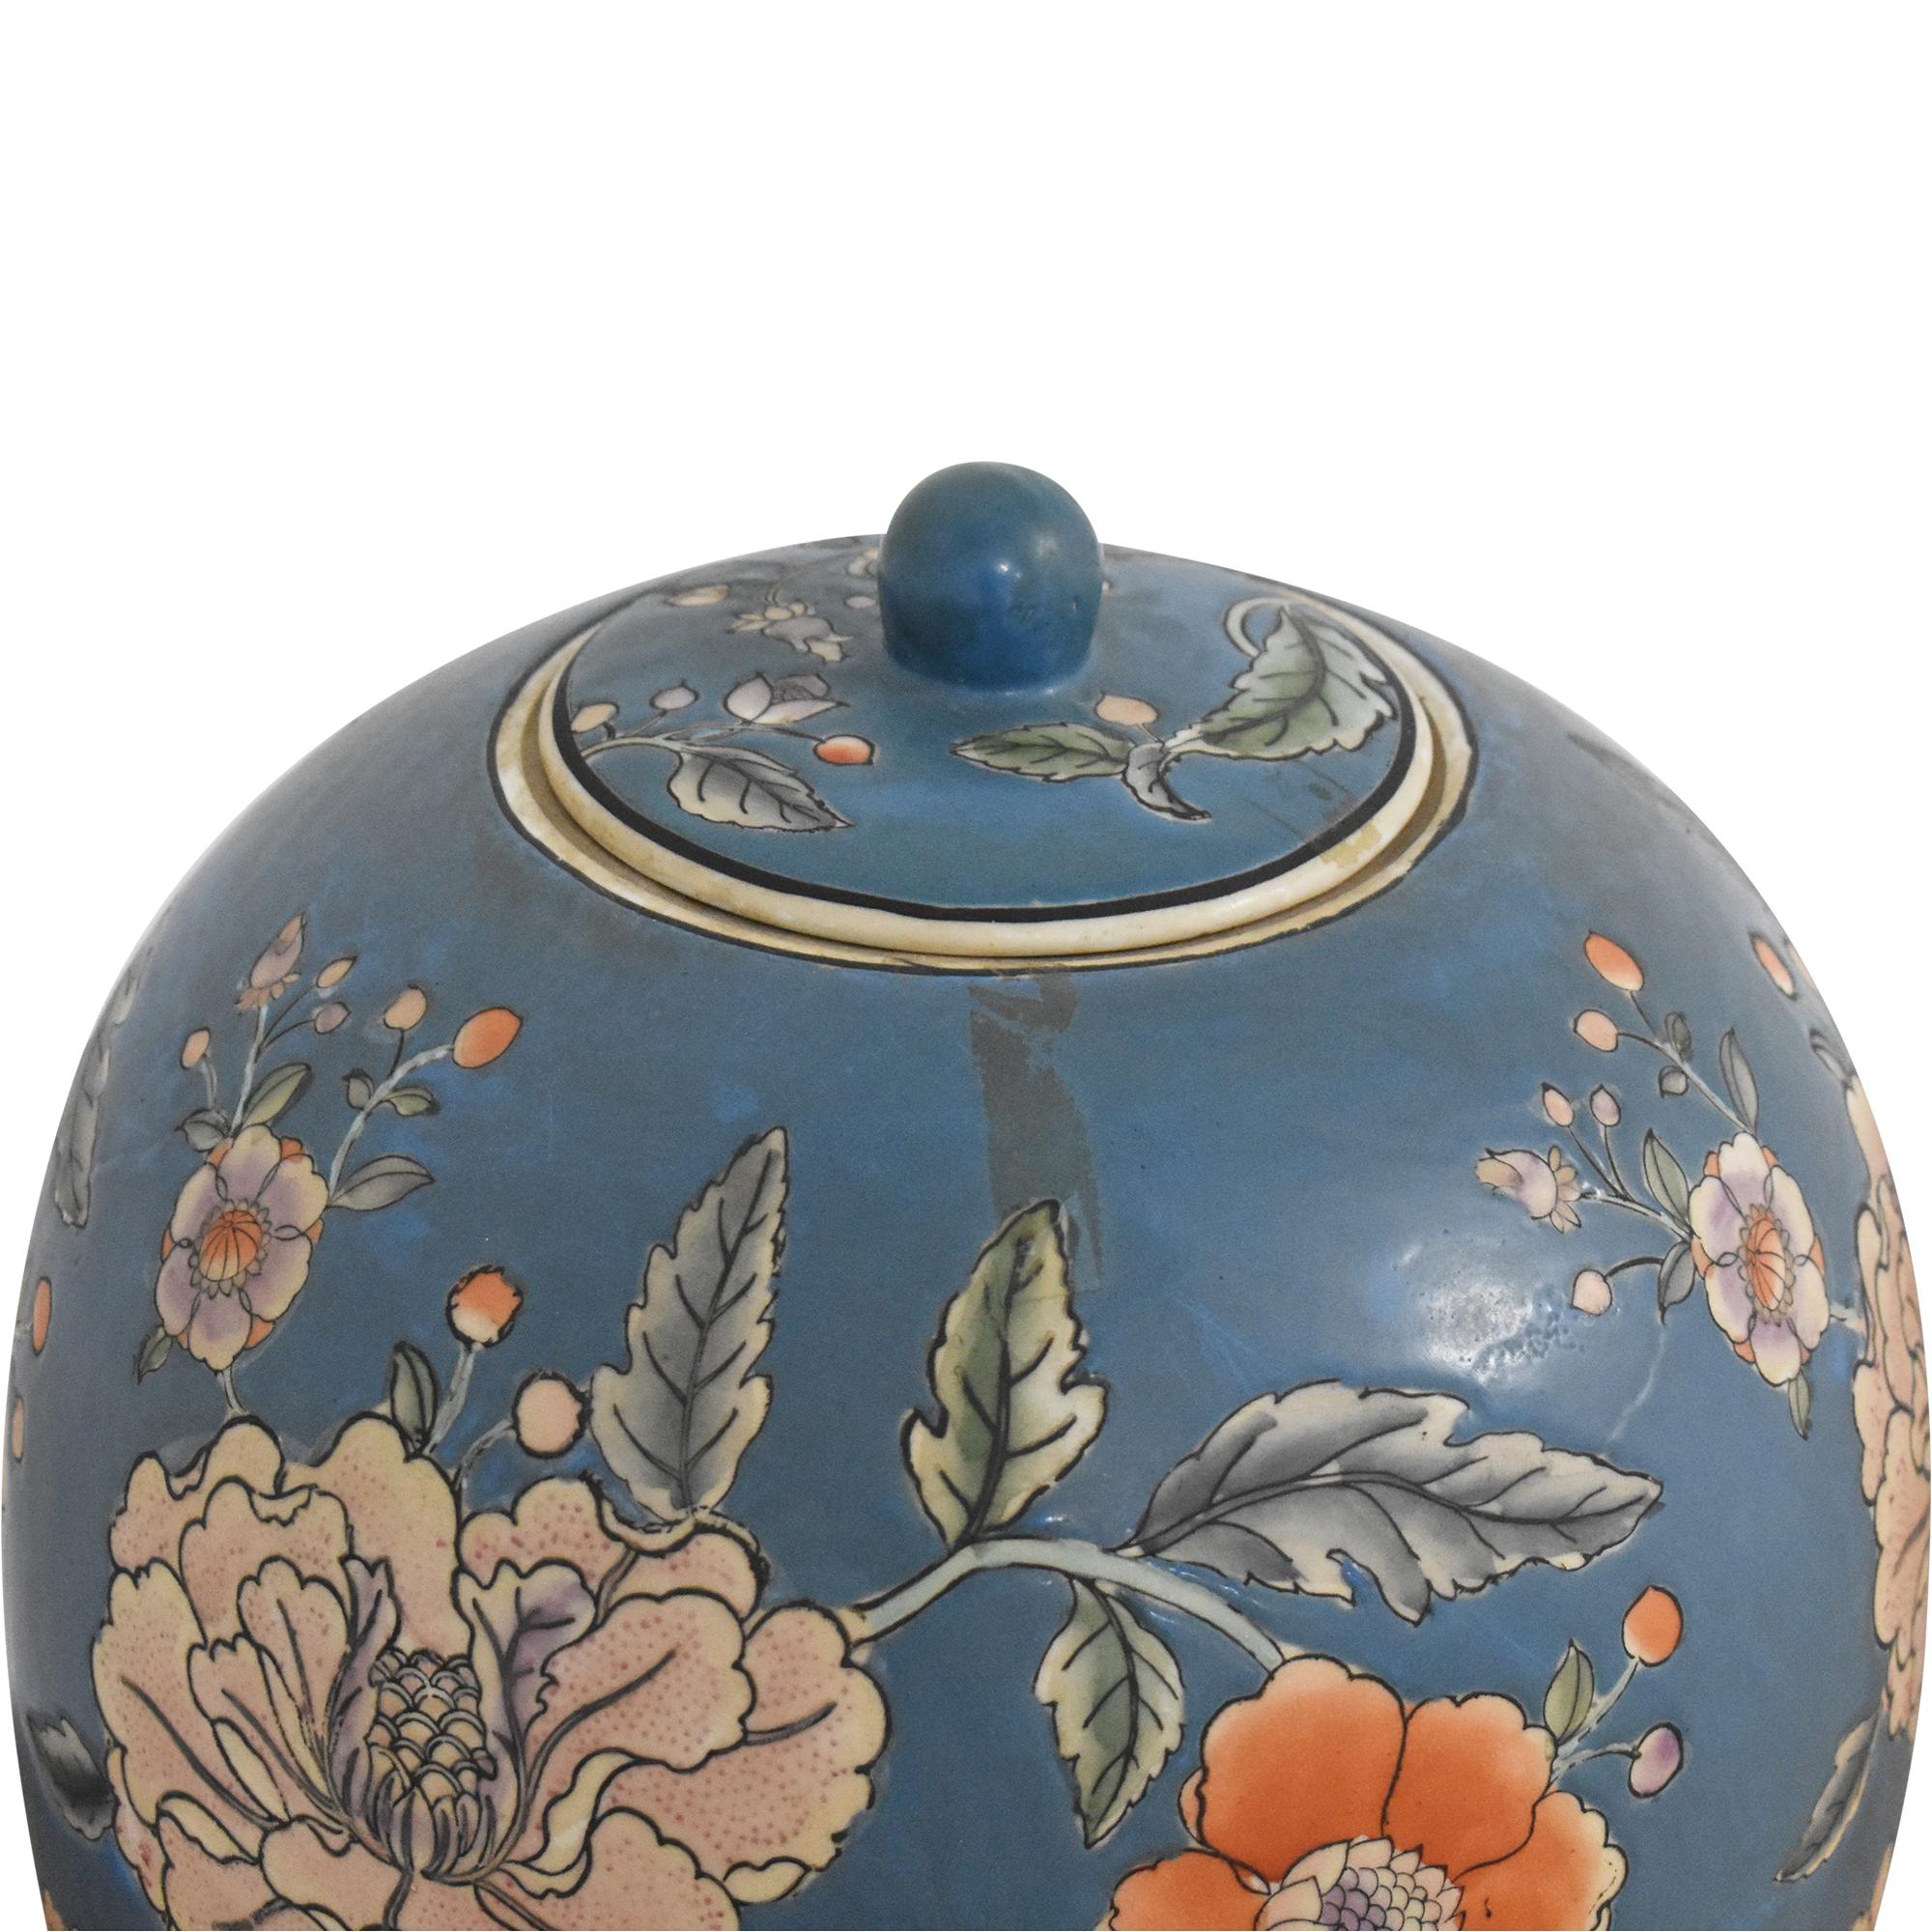 Large Decorative Floral Urn used